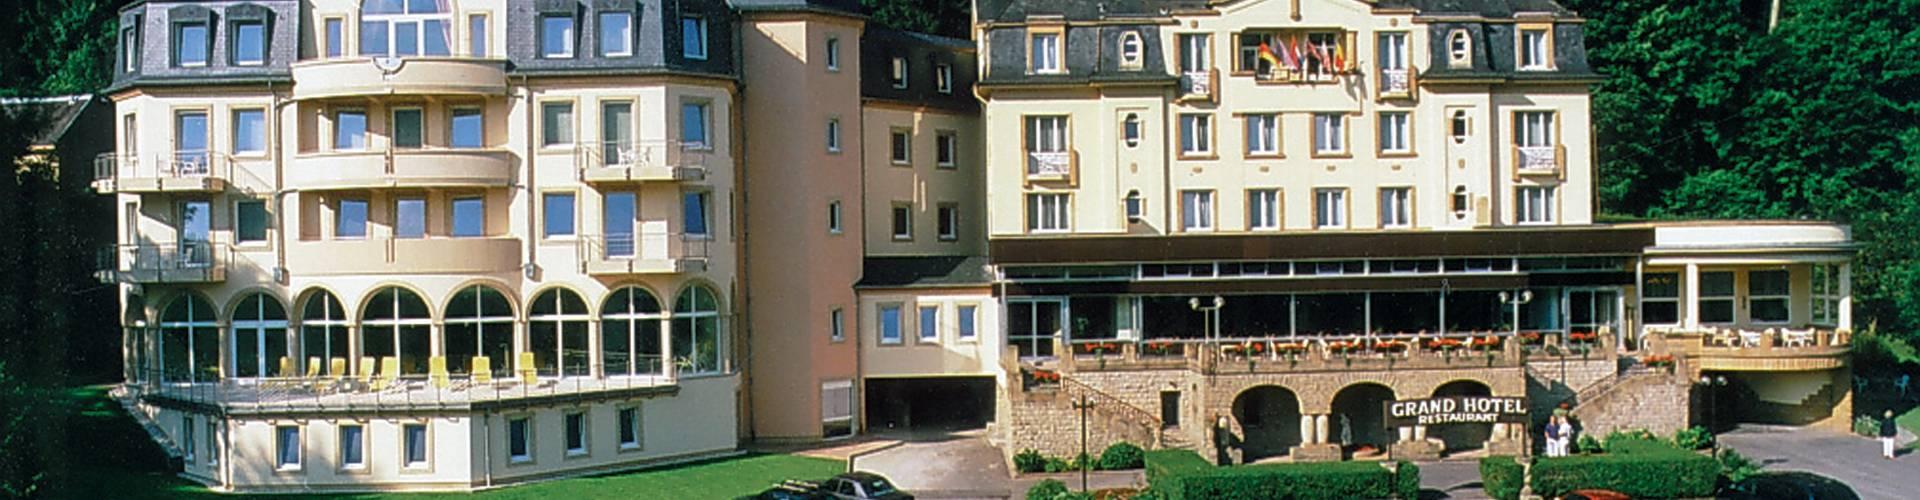 first pic grand hotel 1 echternach09